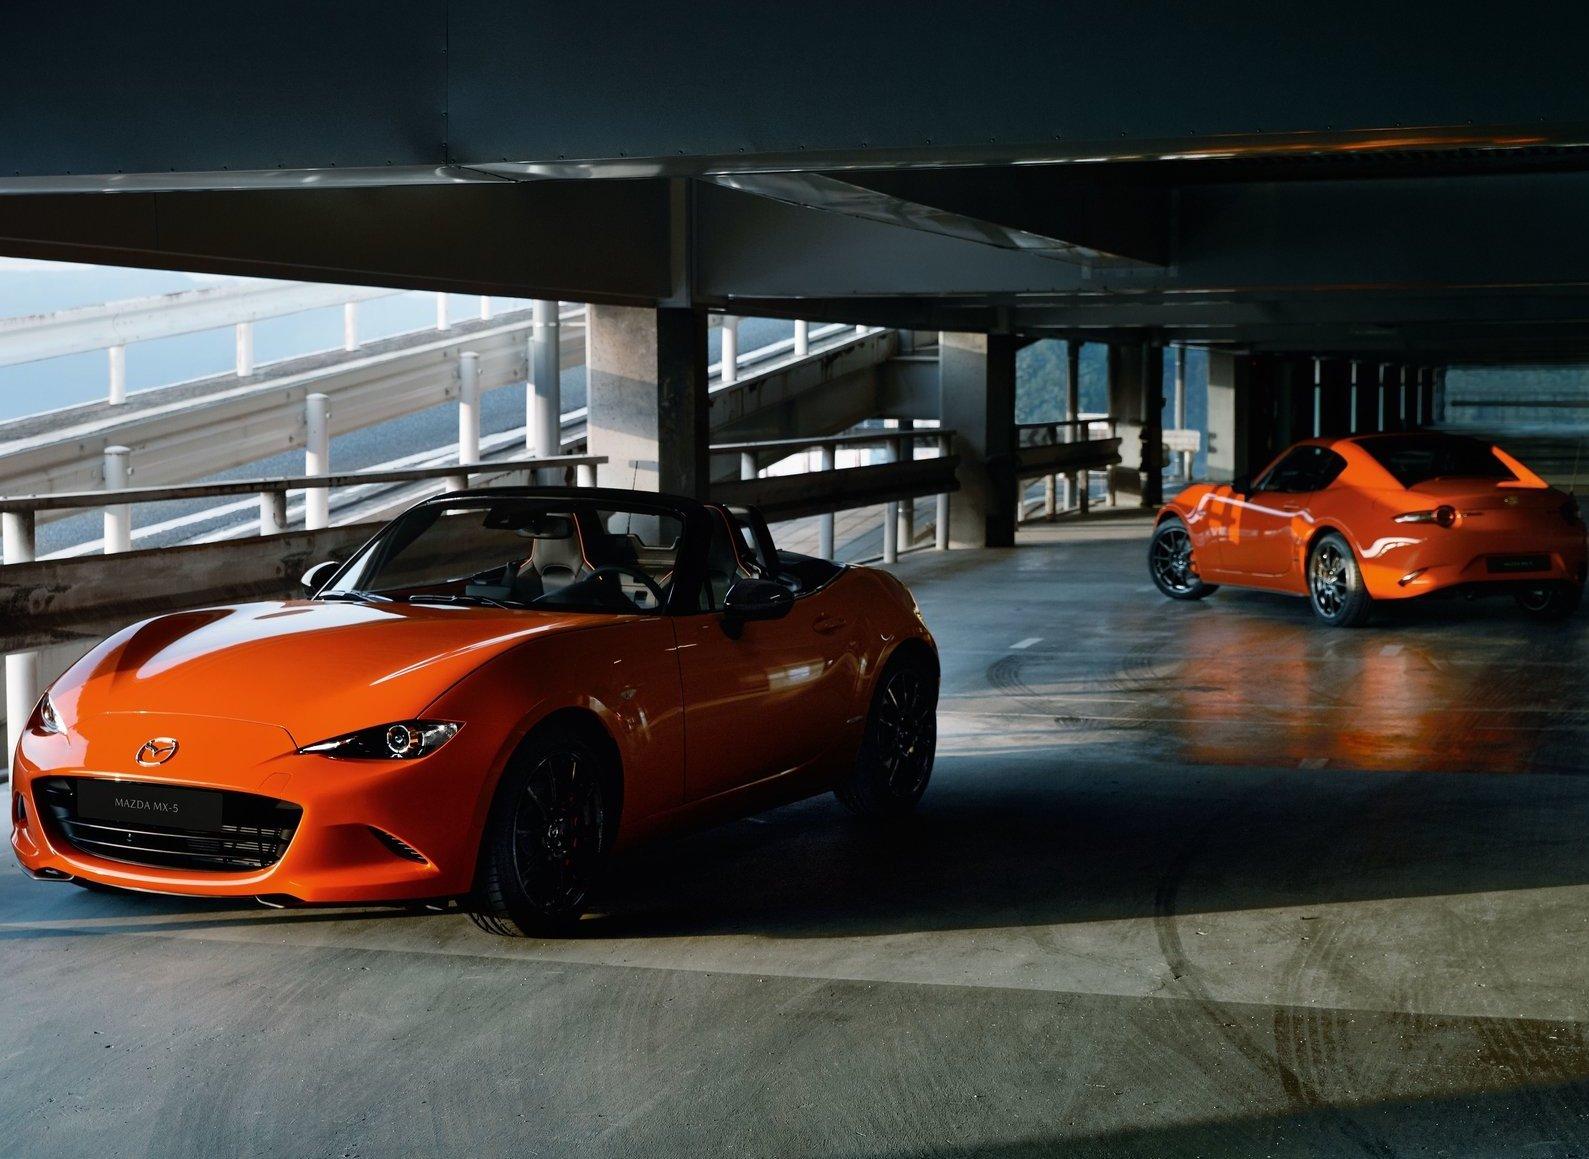 2019 Mazda MX-5 Miata 30th Anniversary Edition parking garage